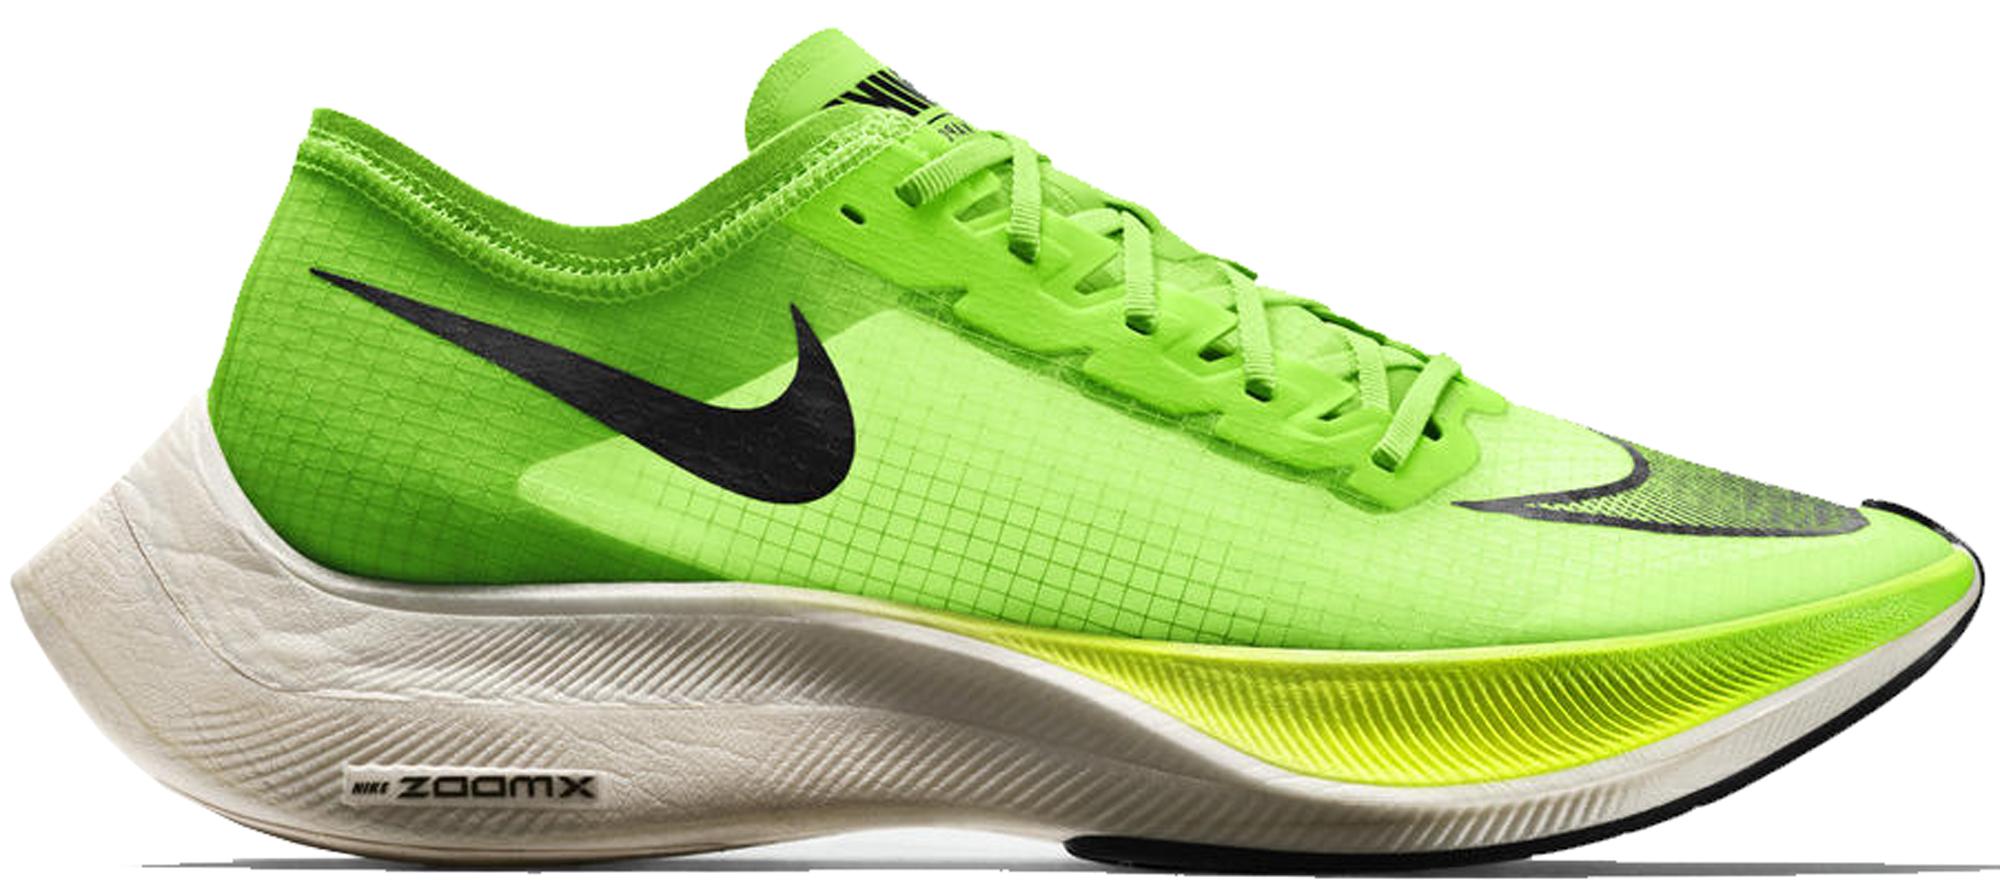 Nike ZoomX Vaporfly Next% Volt - AO4568-300